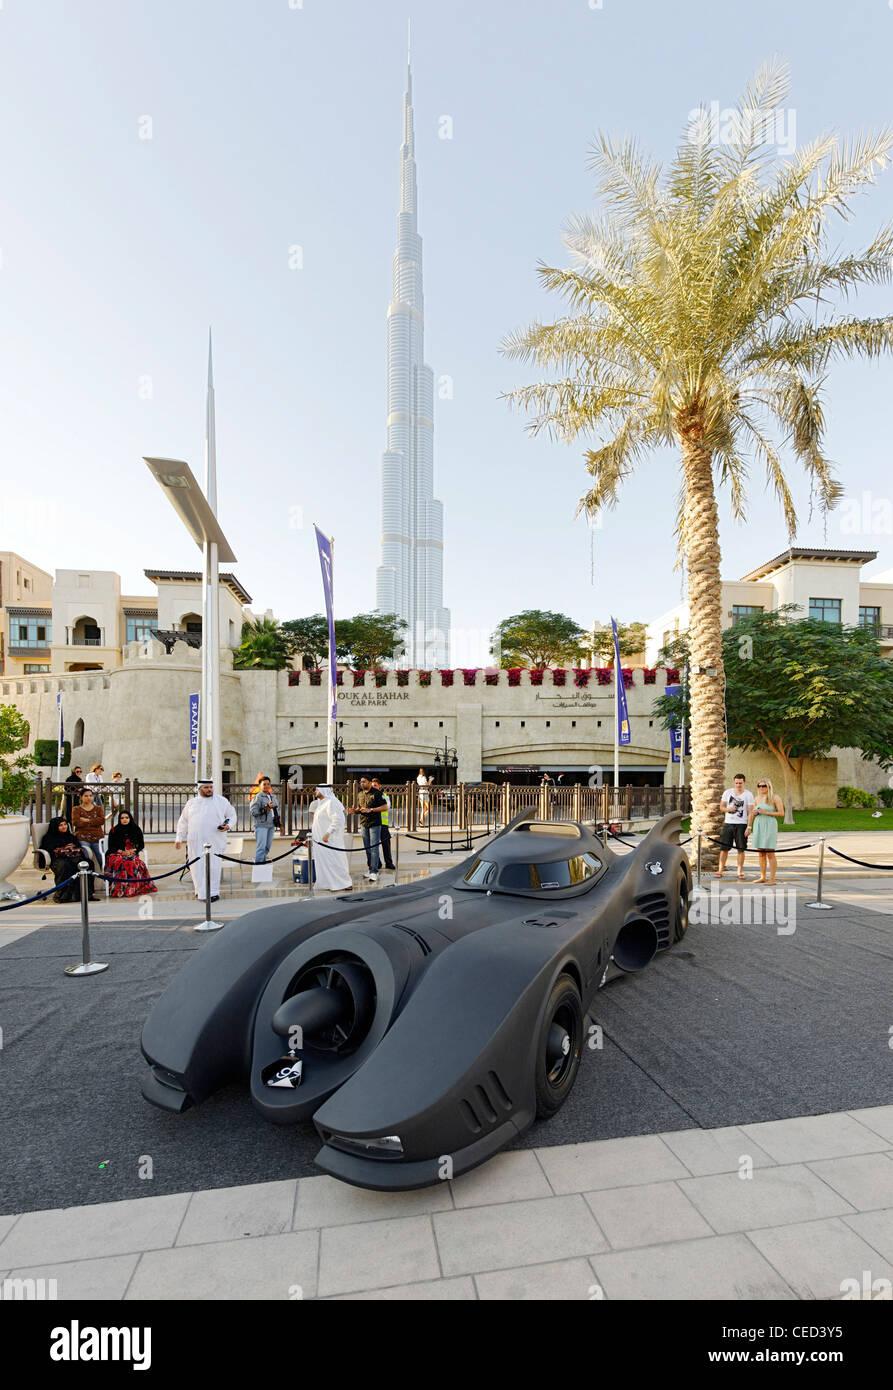 Batmobile, car from the film Batman at the Dubai Classic Motor Show - Stock Image